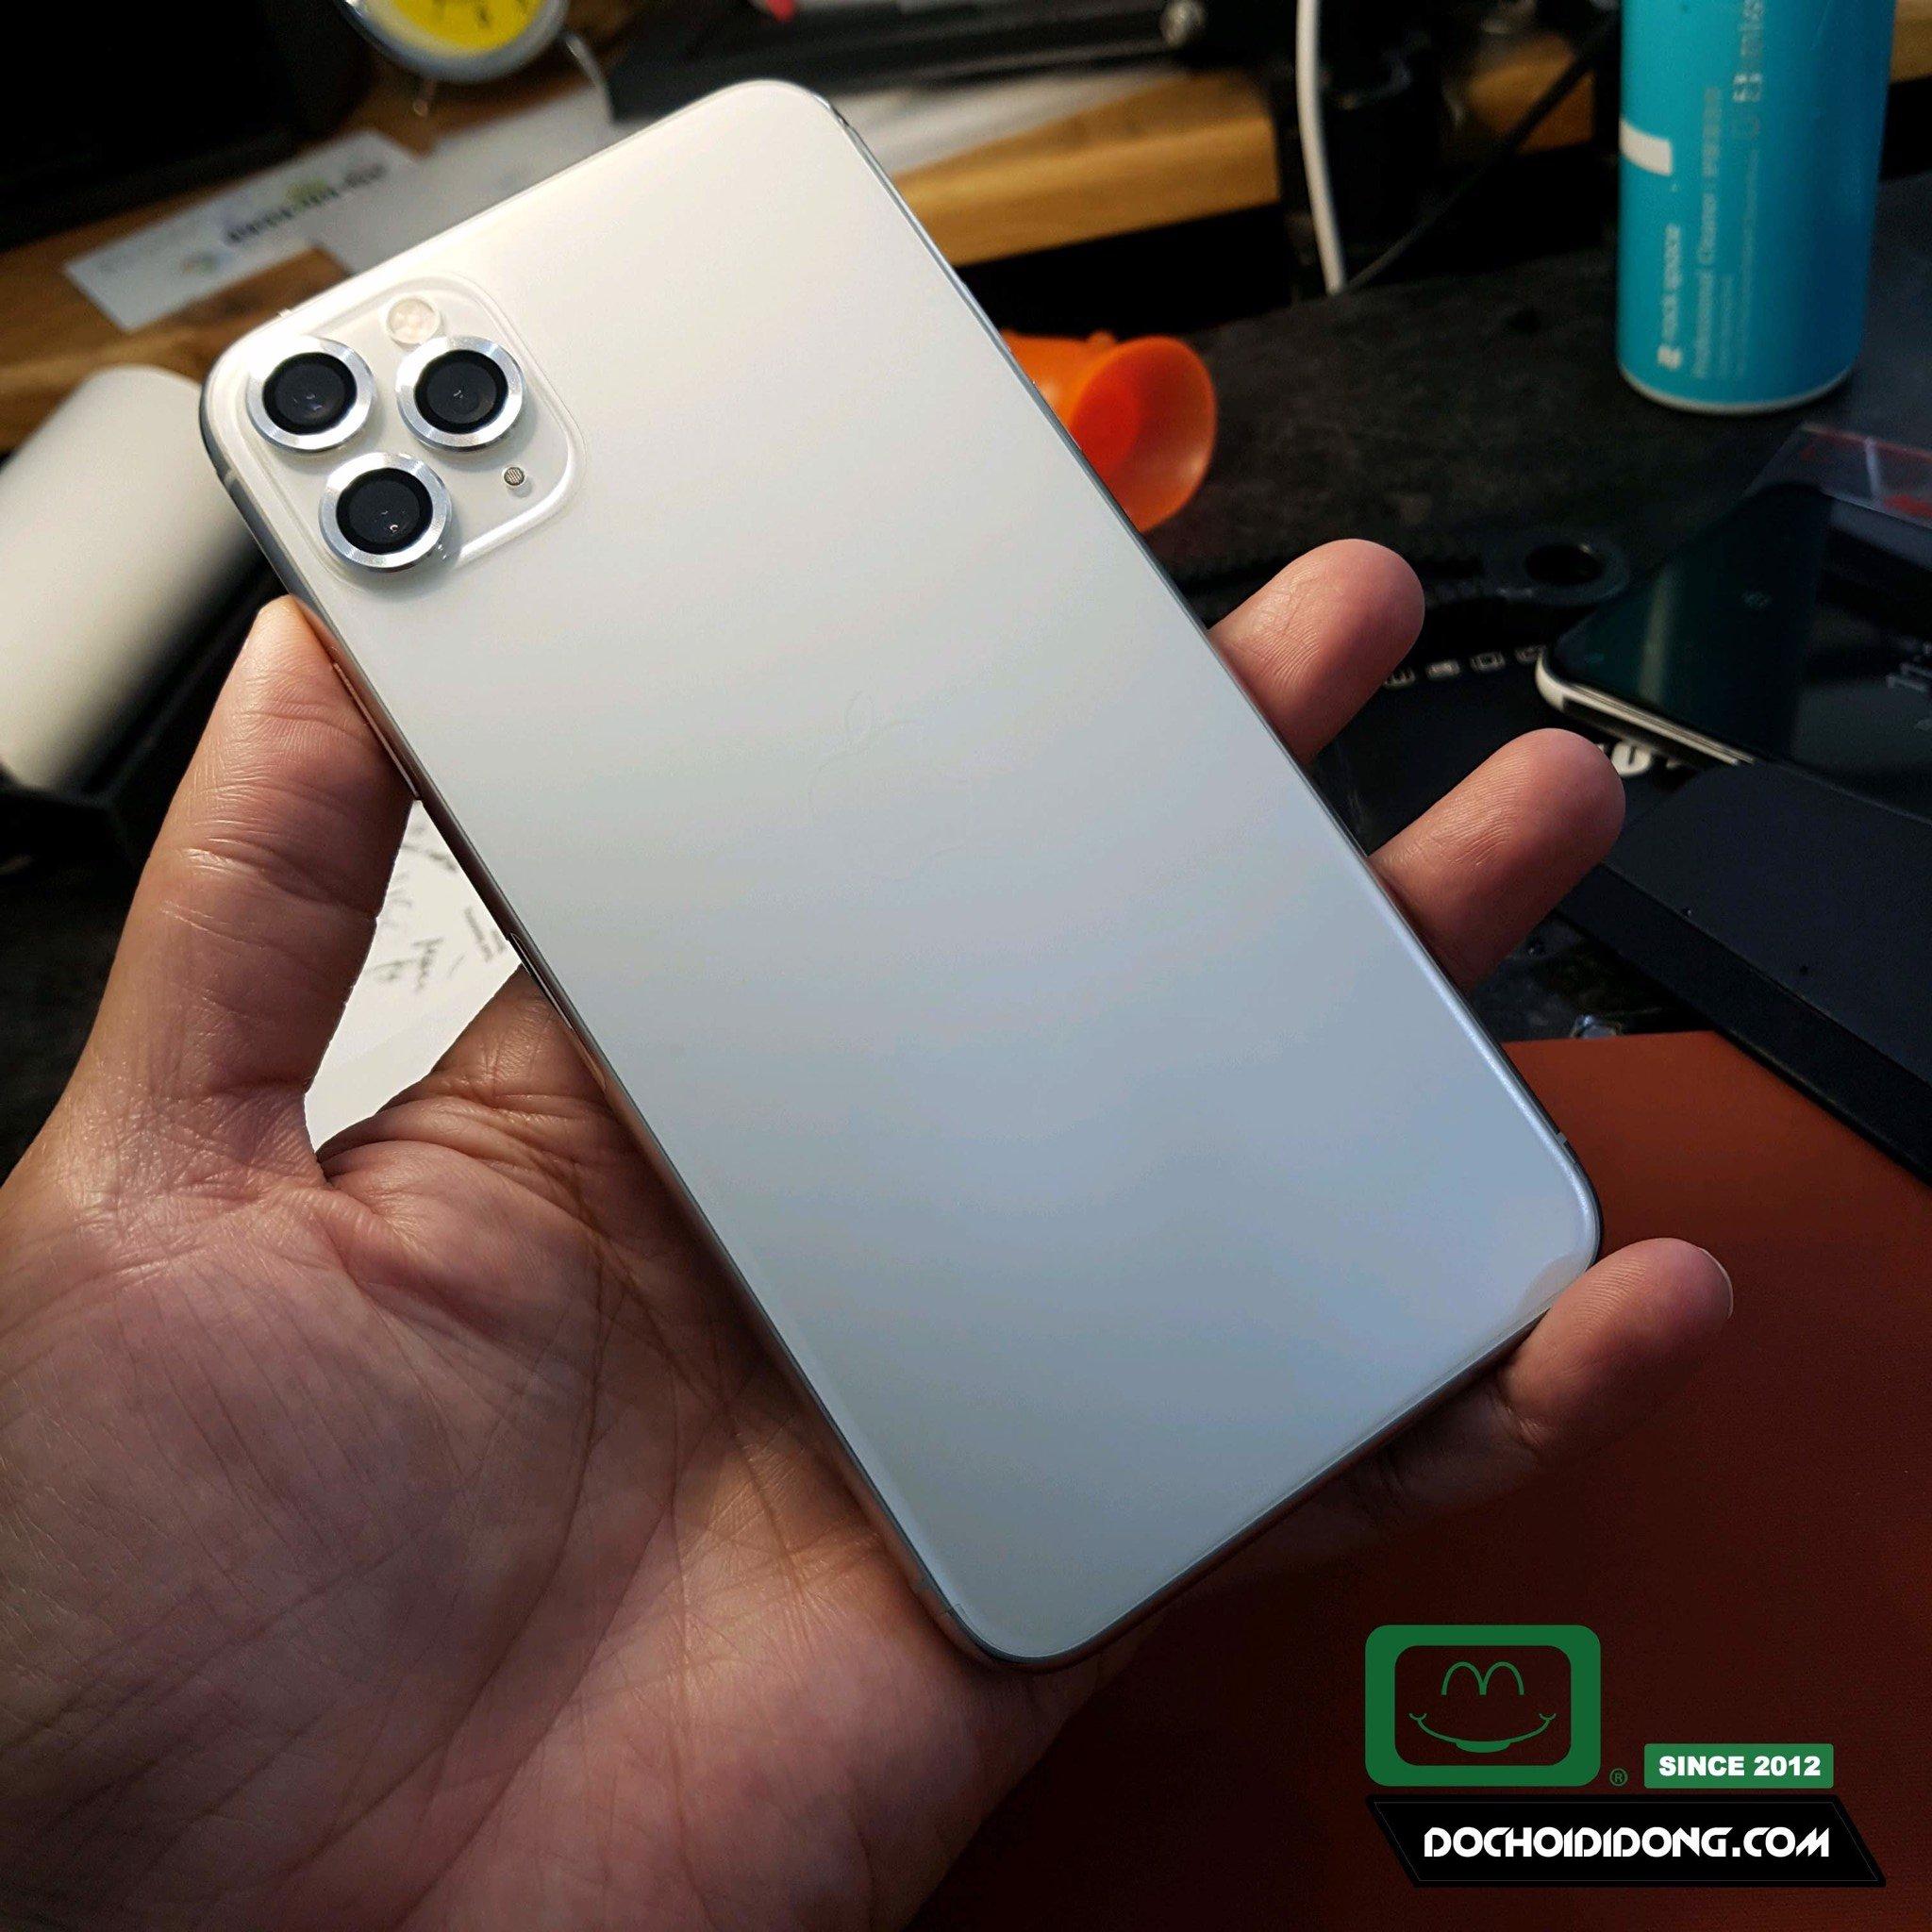 mieng-dan-ppf-rock-iphone-11-pro-max-trong-nham-doi-mau-cao-cap